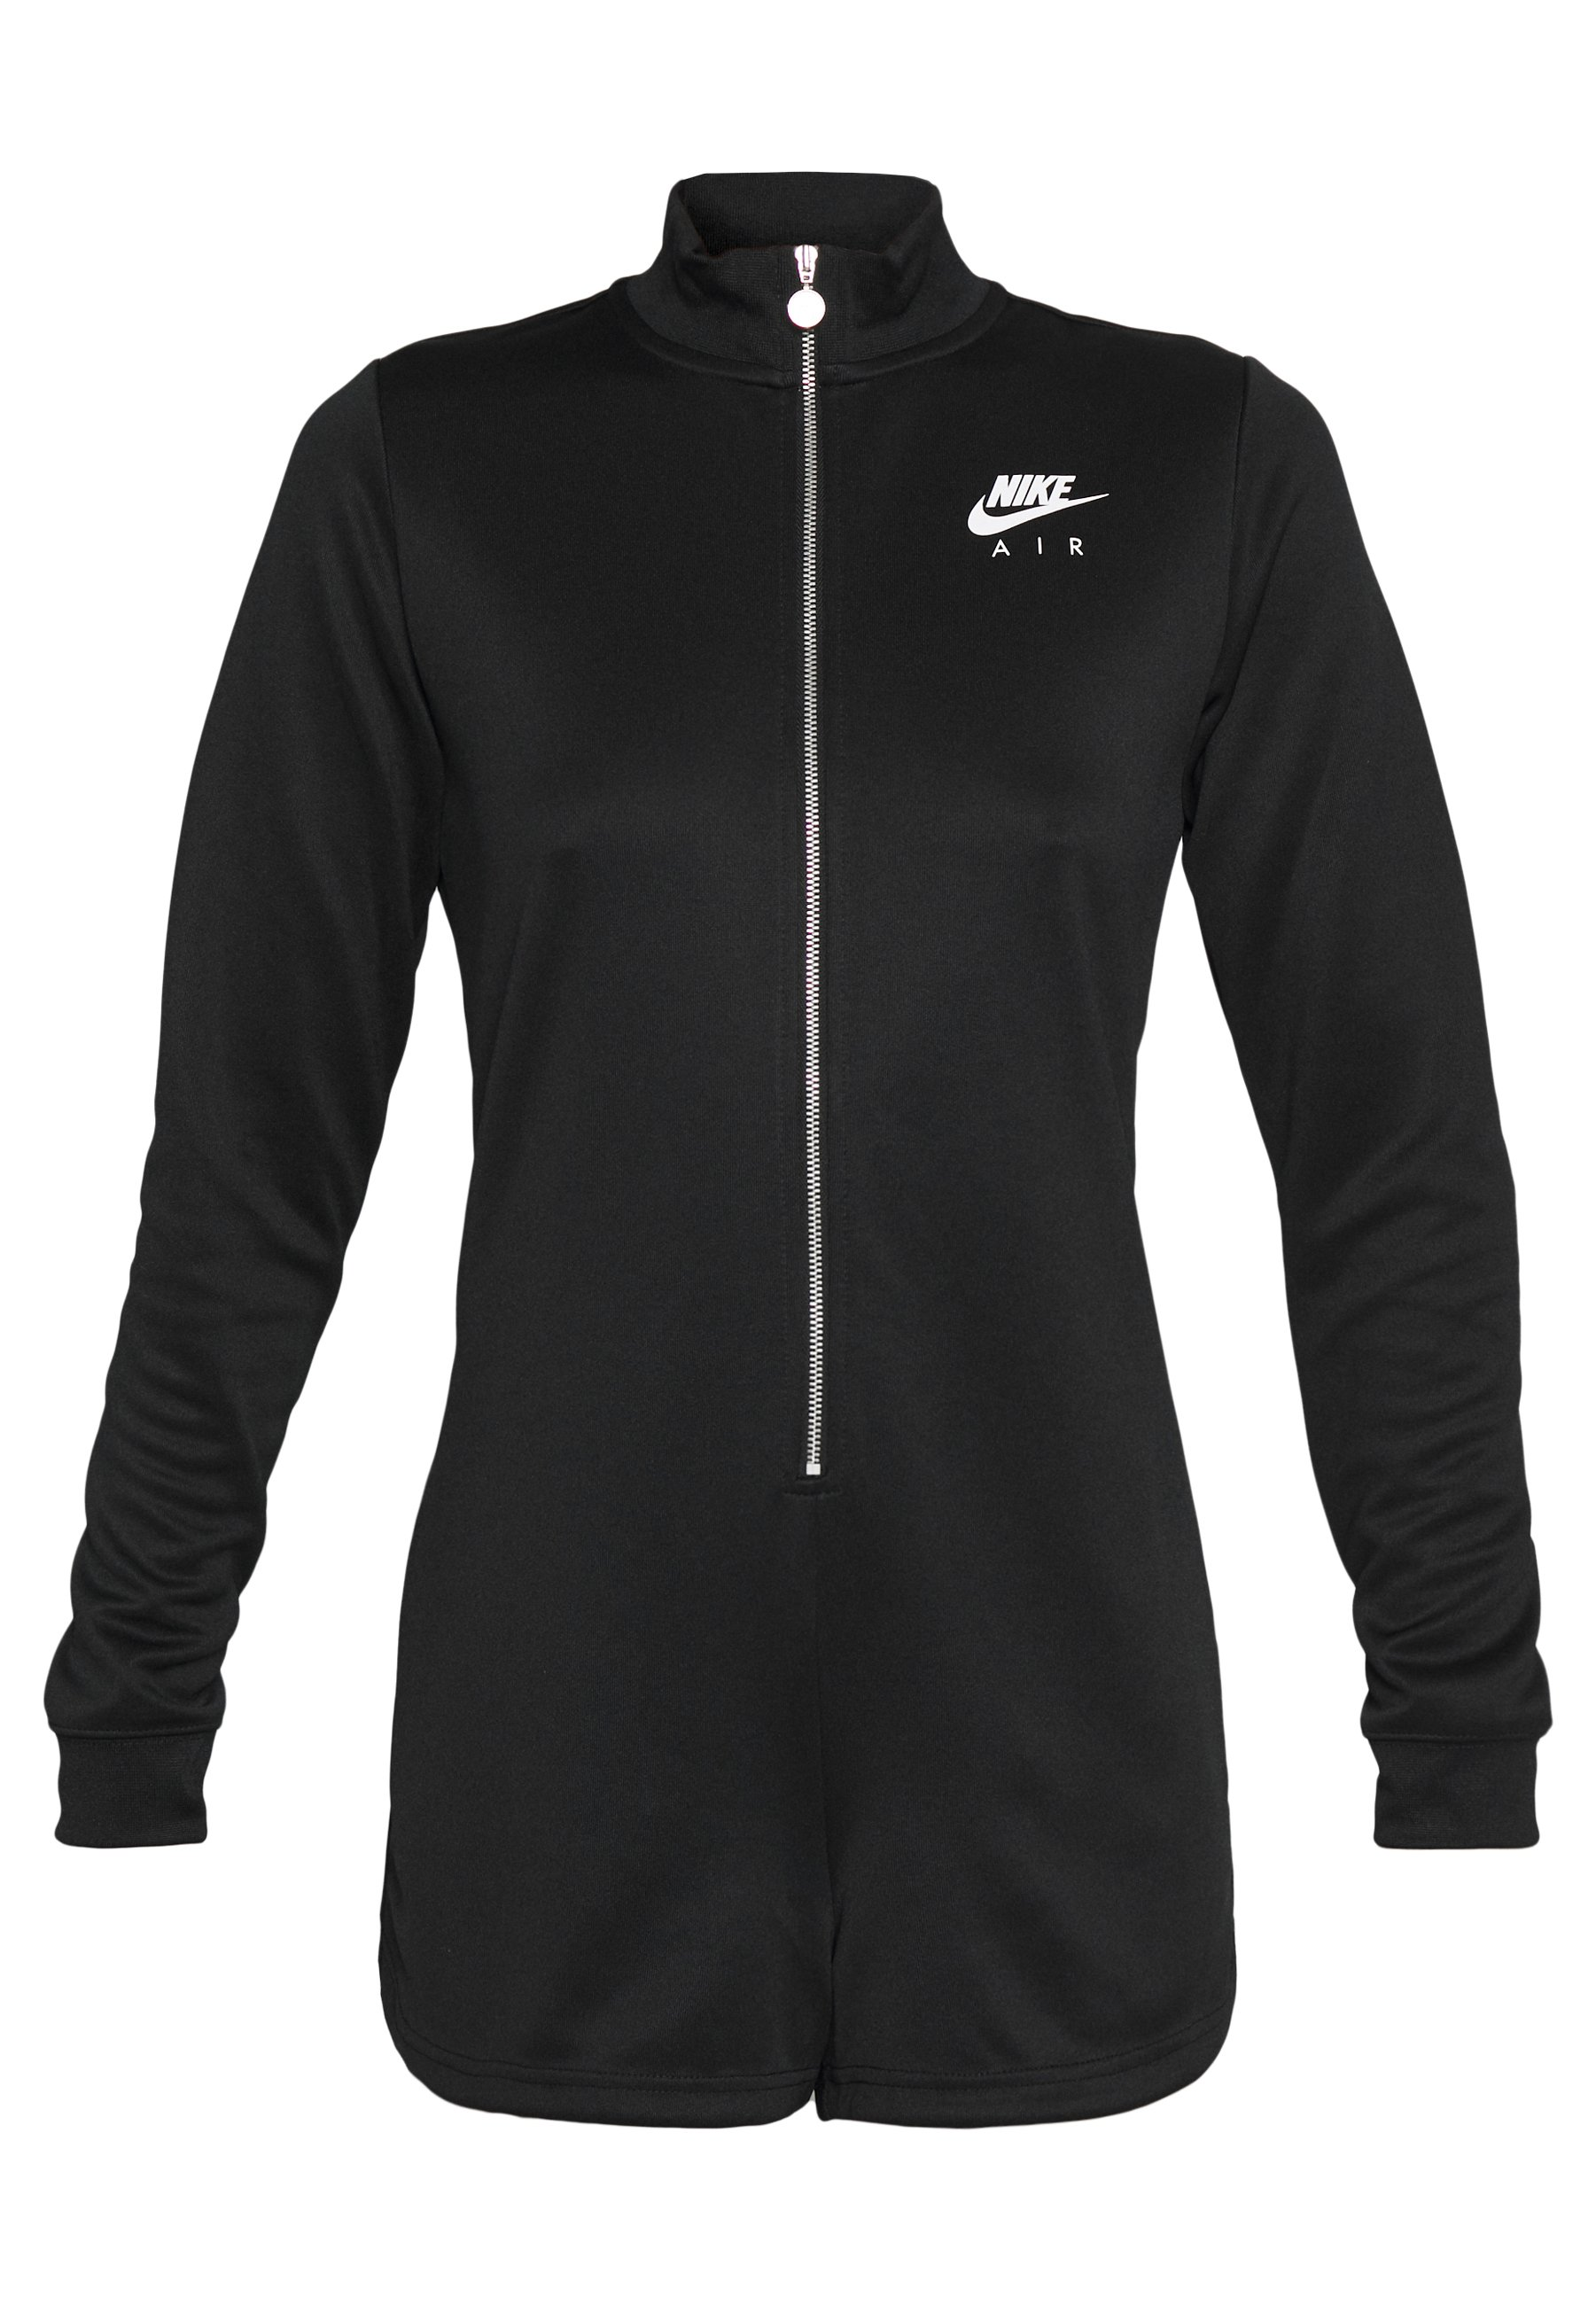 Nike Sportswear Air Romper - Jumpsuit Black/ice Silver Black Friday